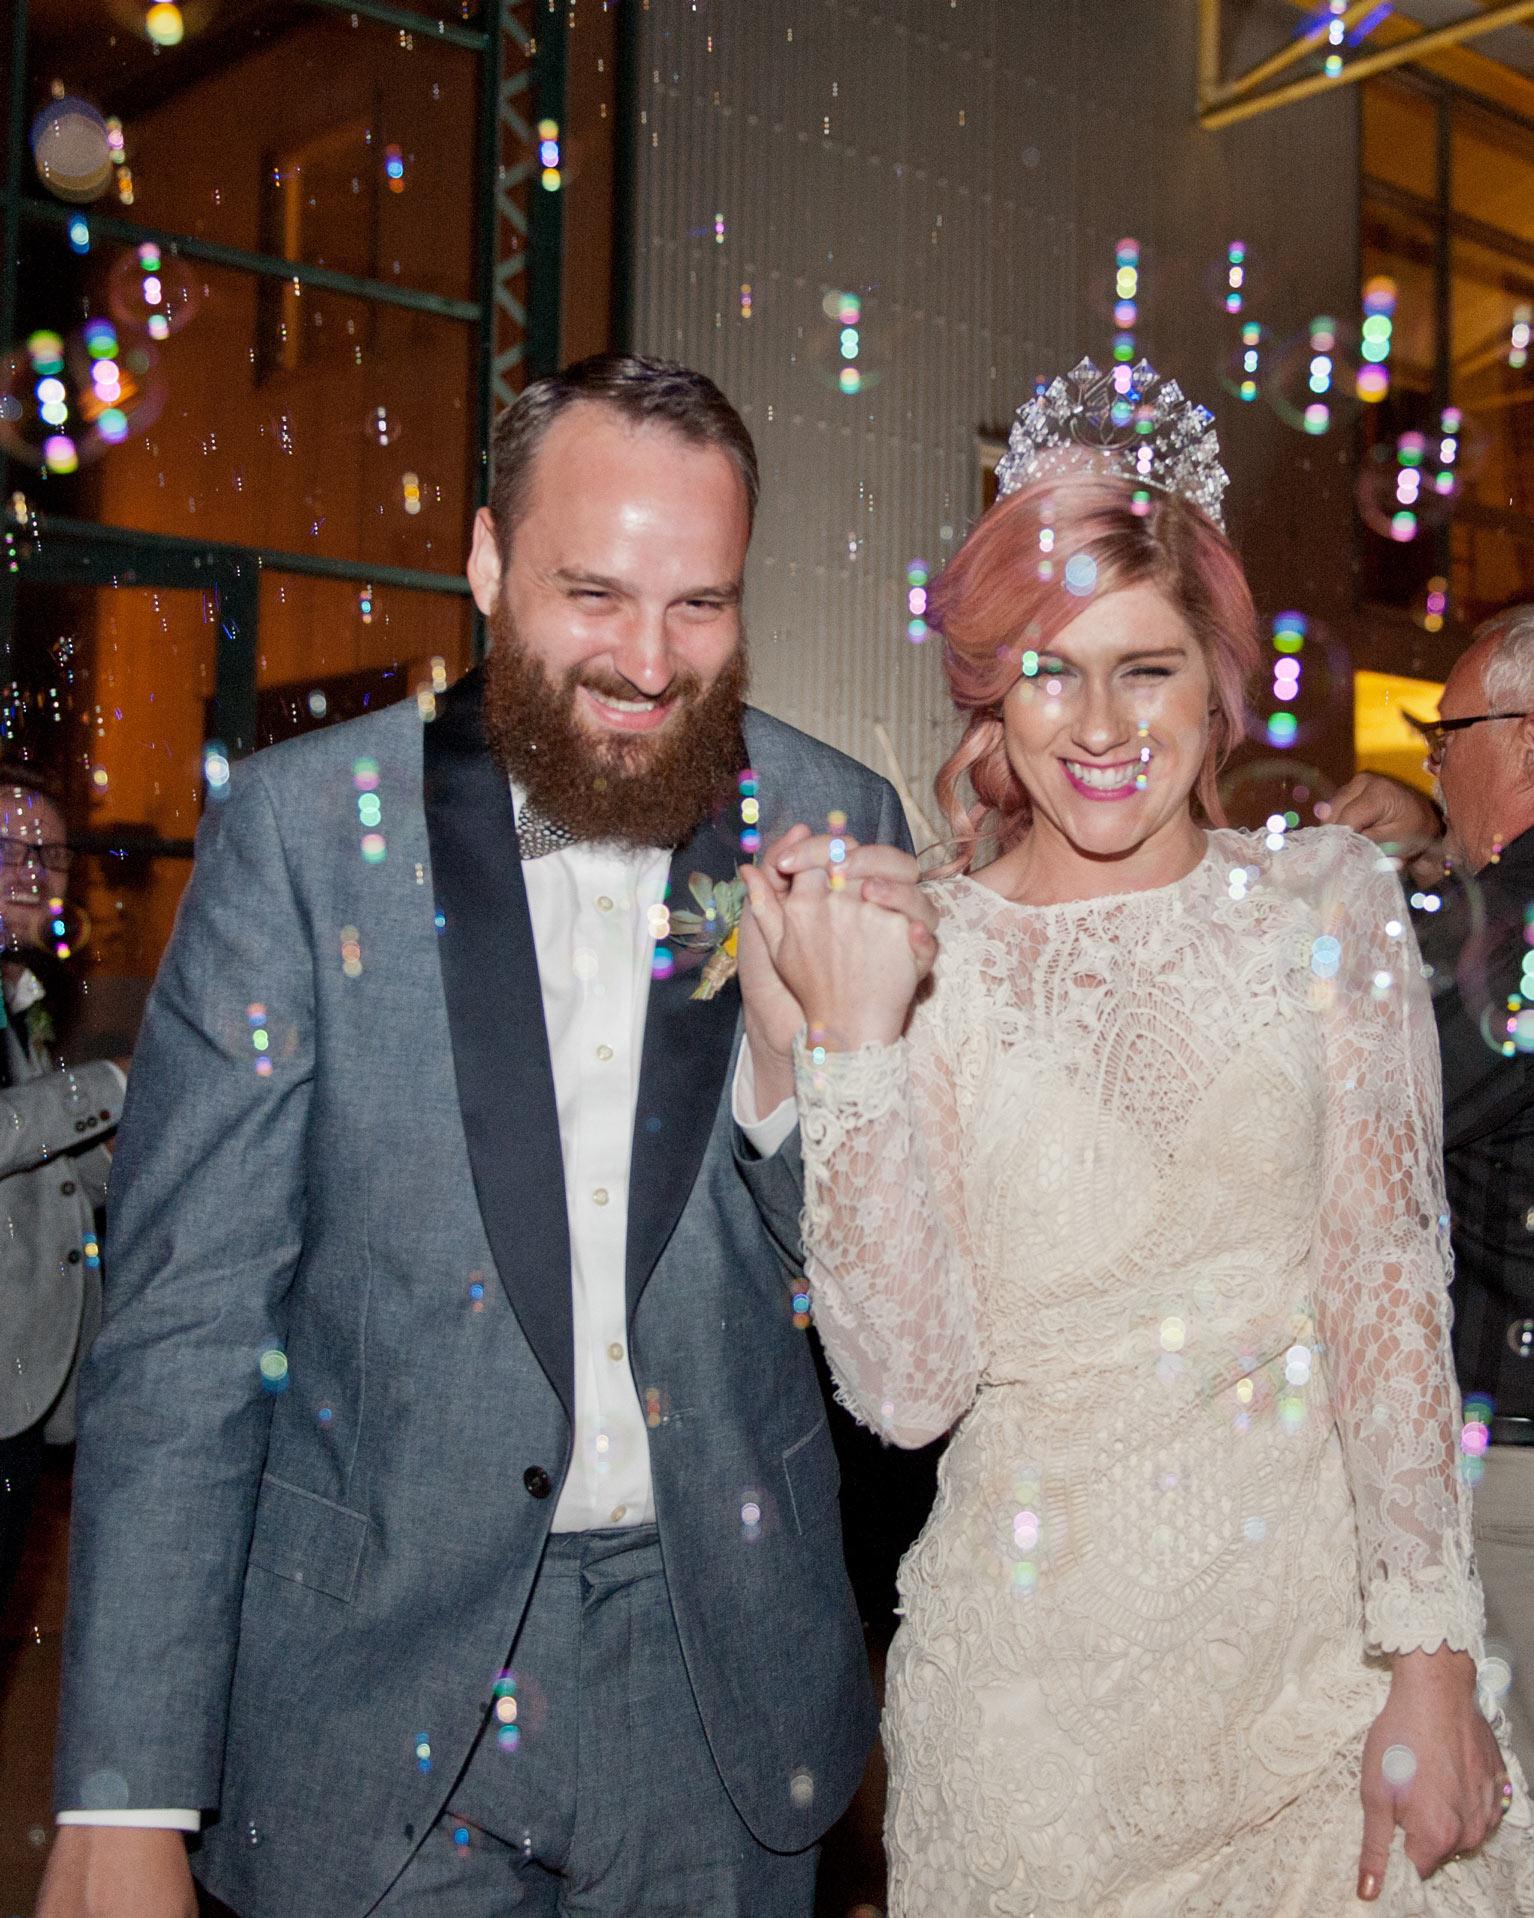 abby-chris-wedding-texas-getaway-bubbles-0847-s112832-0516.jpg